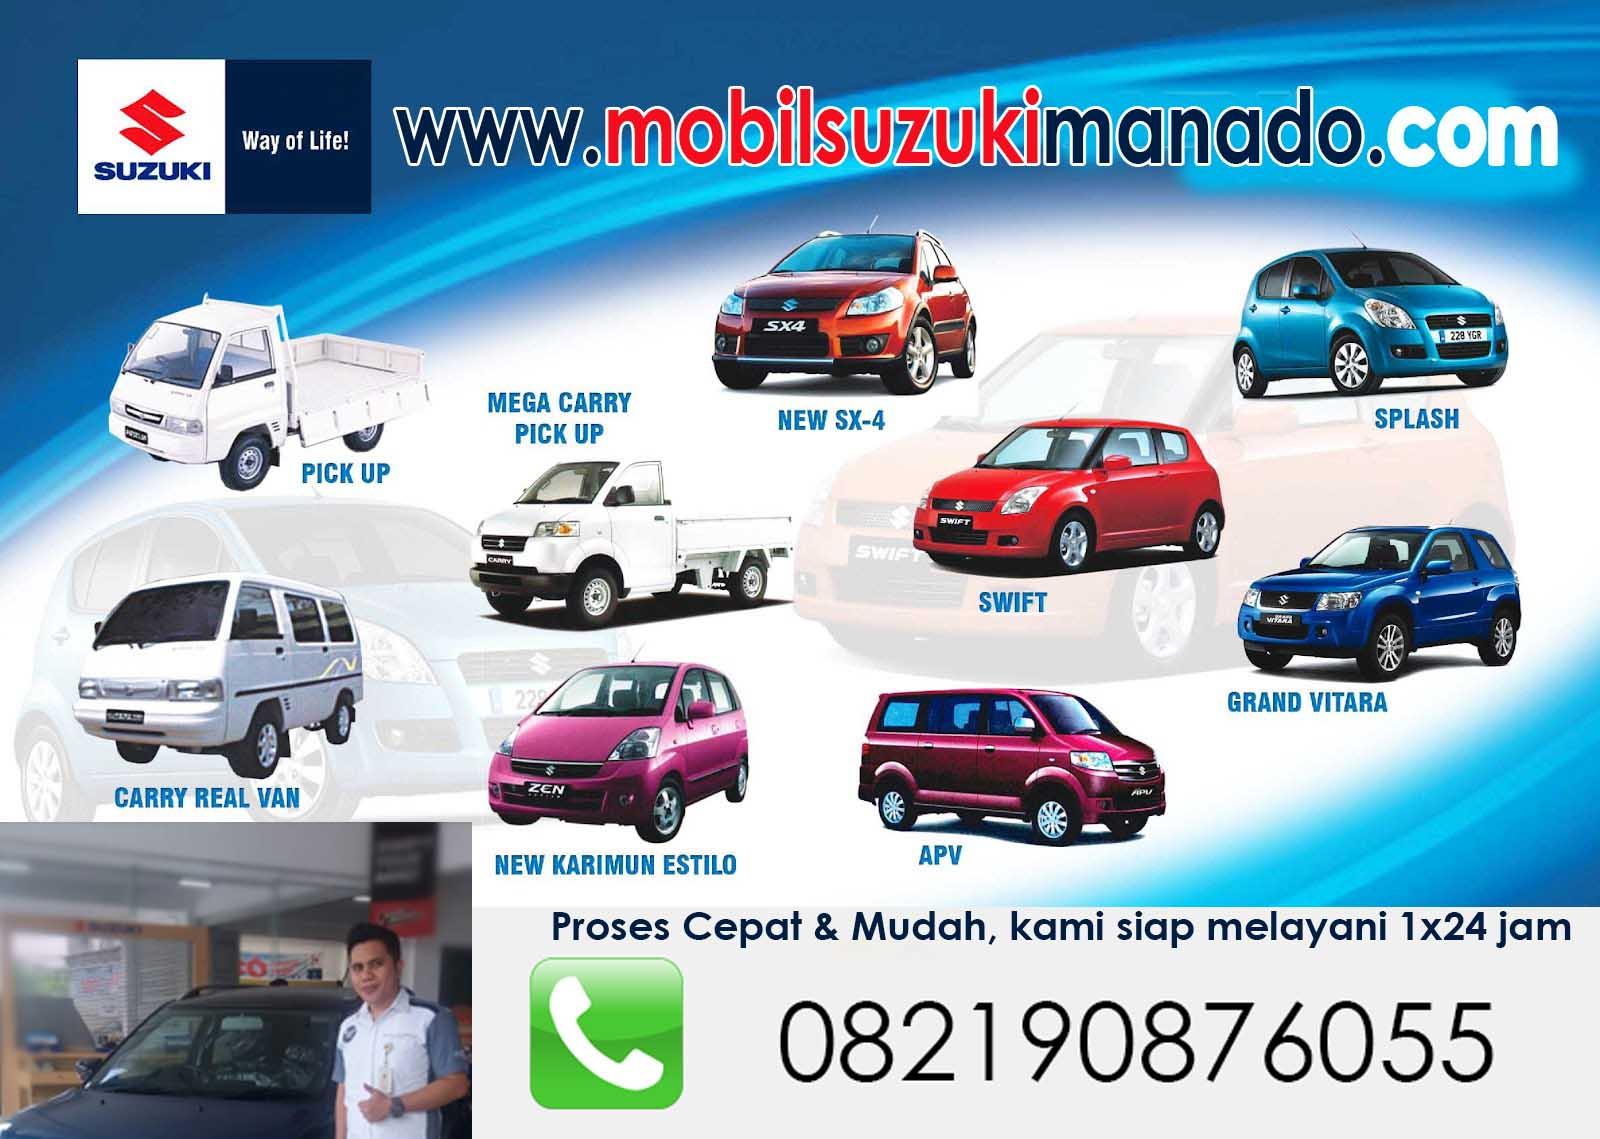 Harga Mobil Suzuki Manado